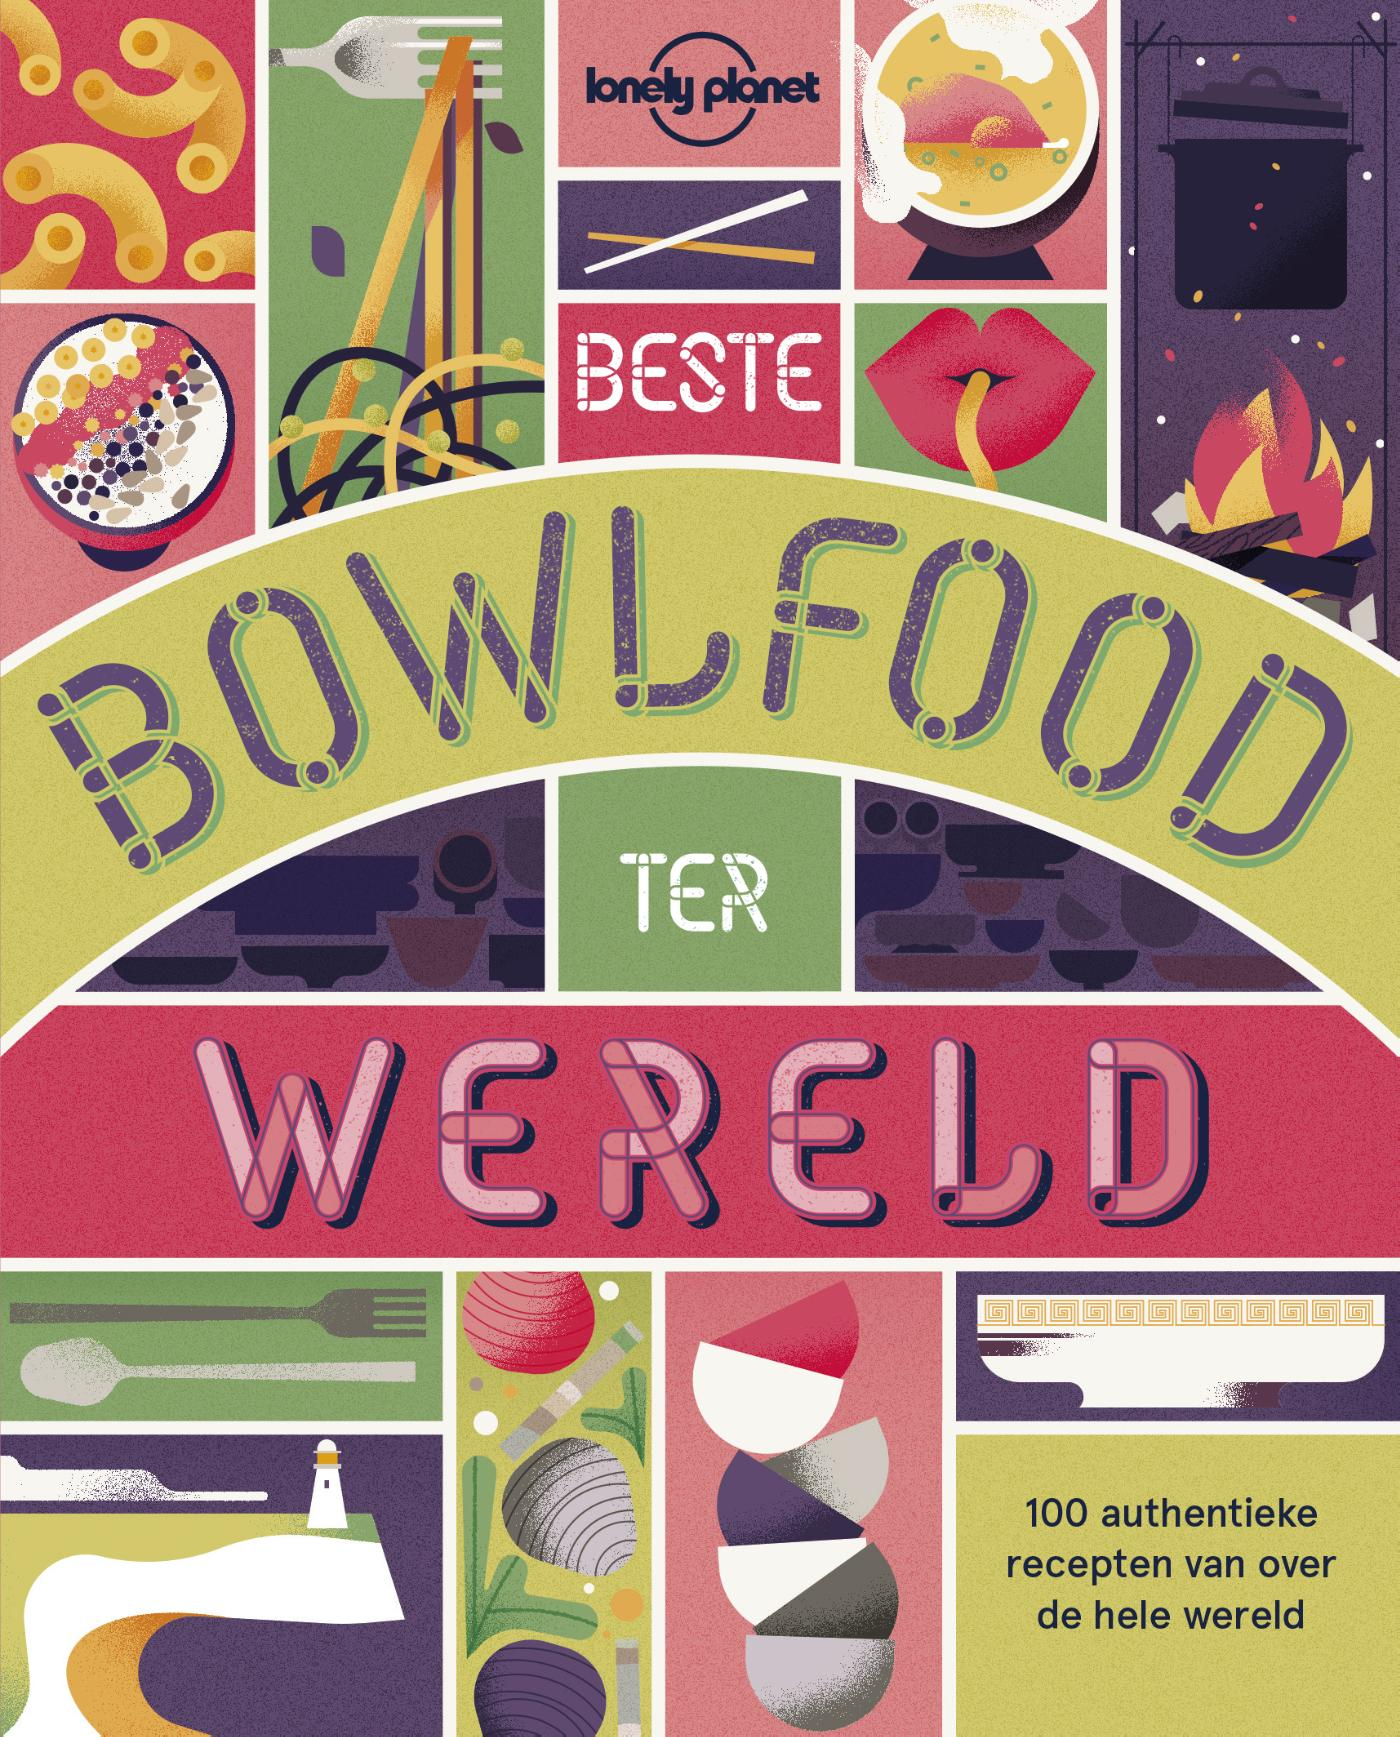 Lonely Planet Beste bowlfood ter wereld